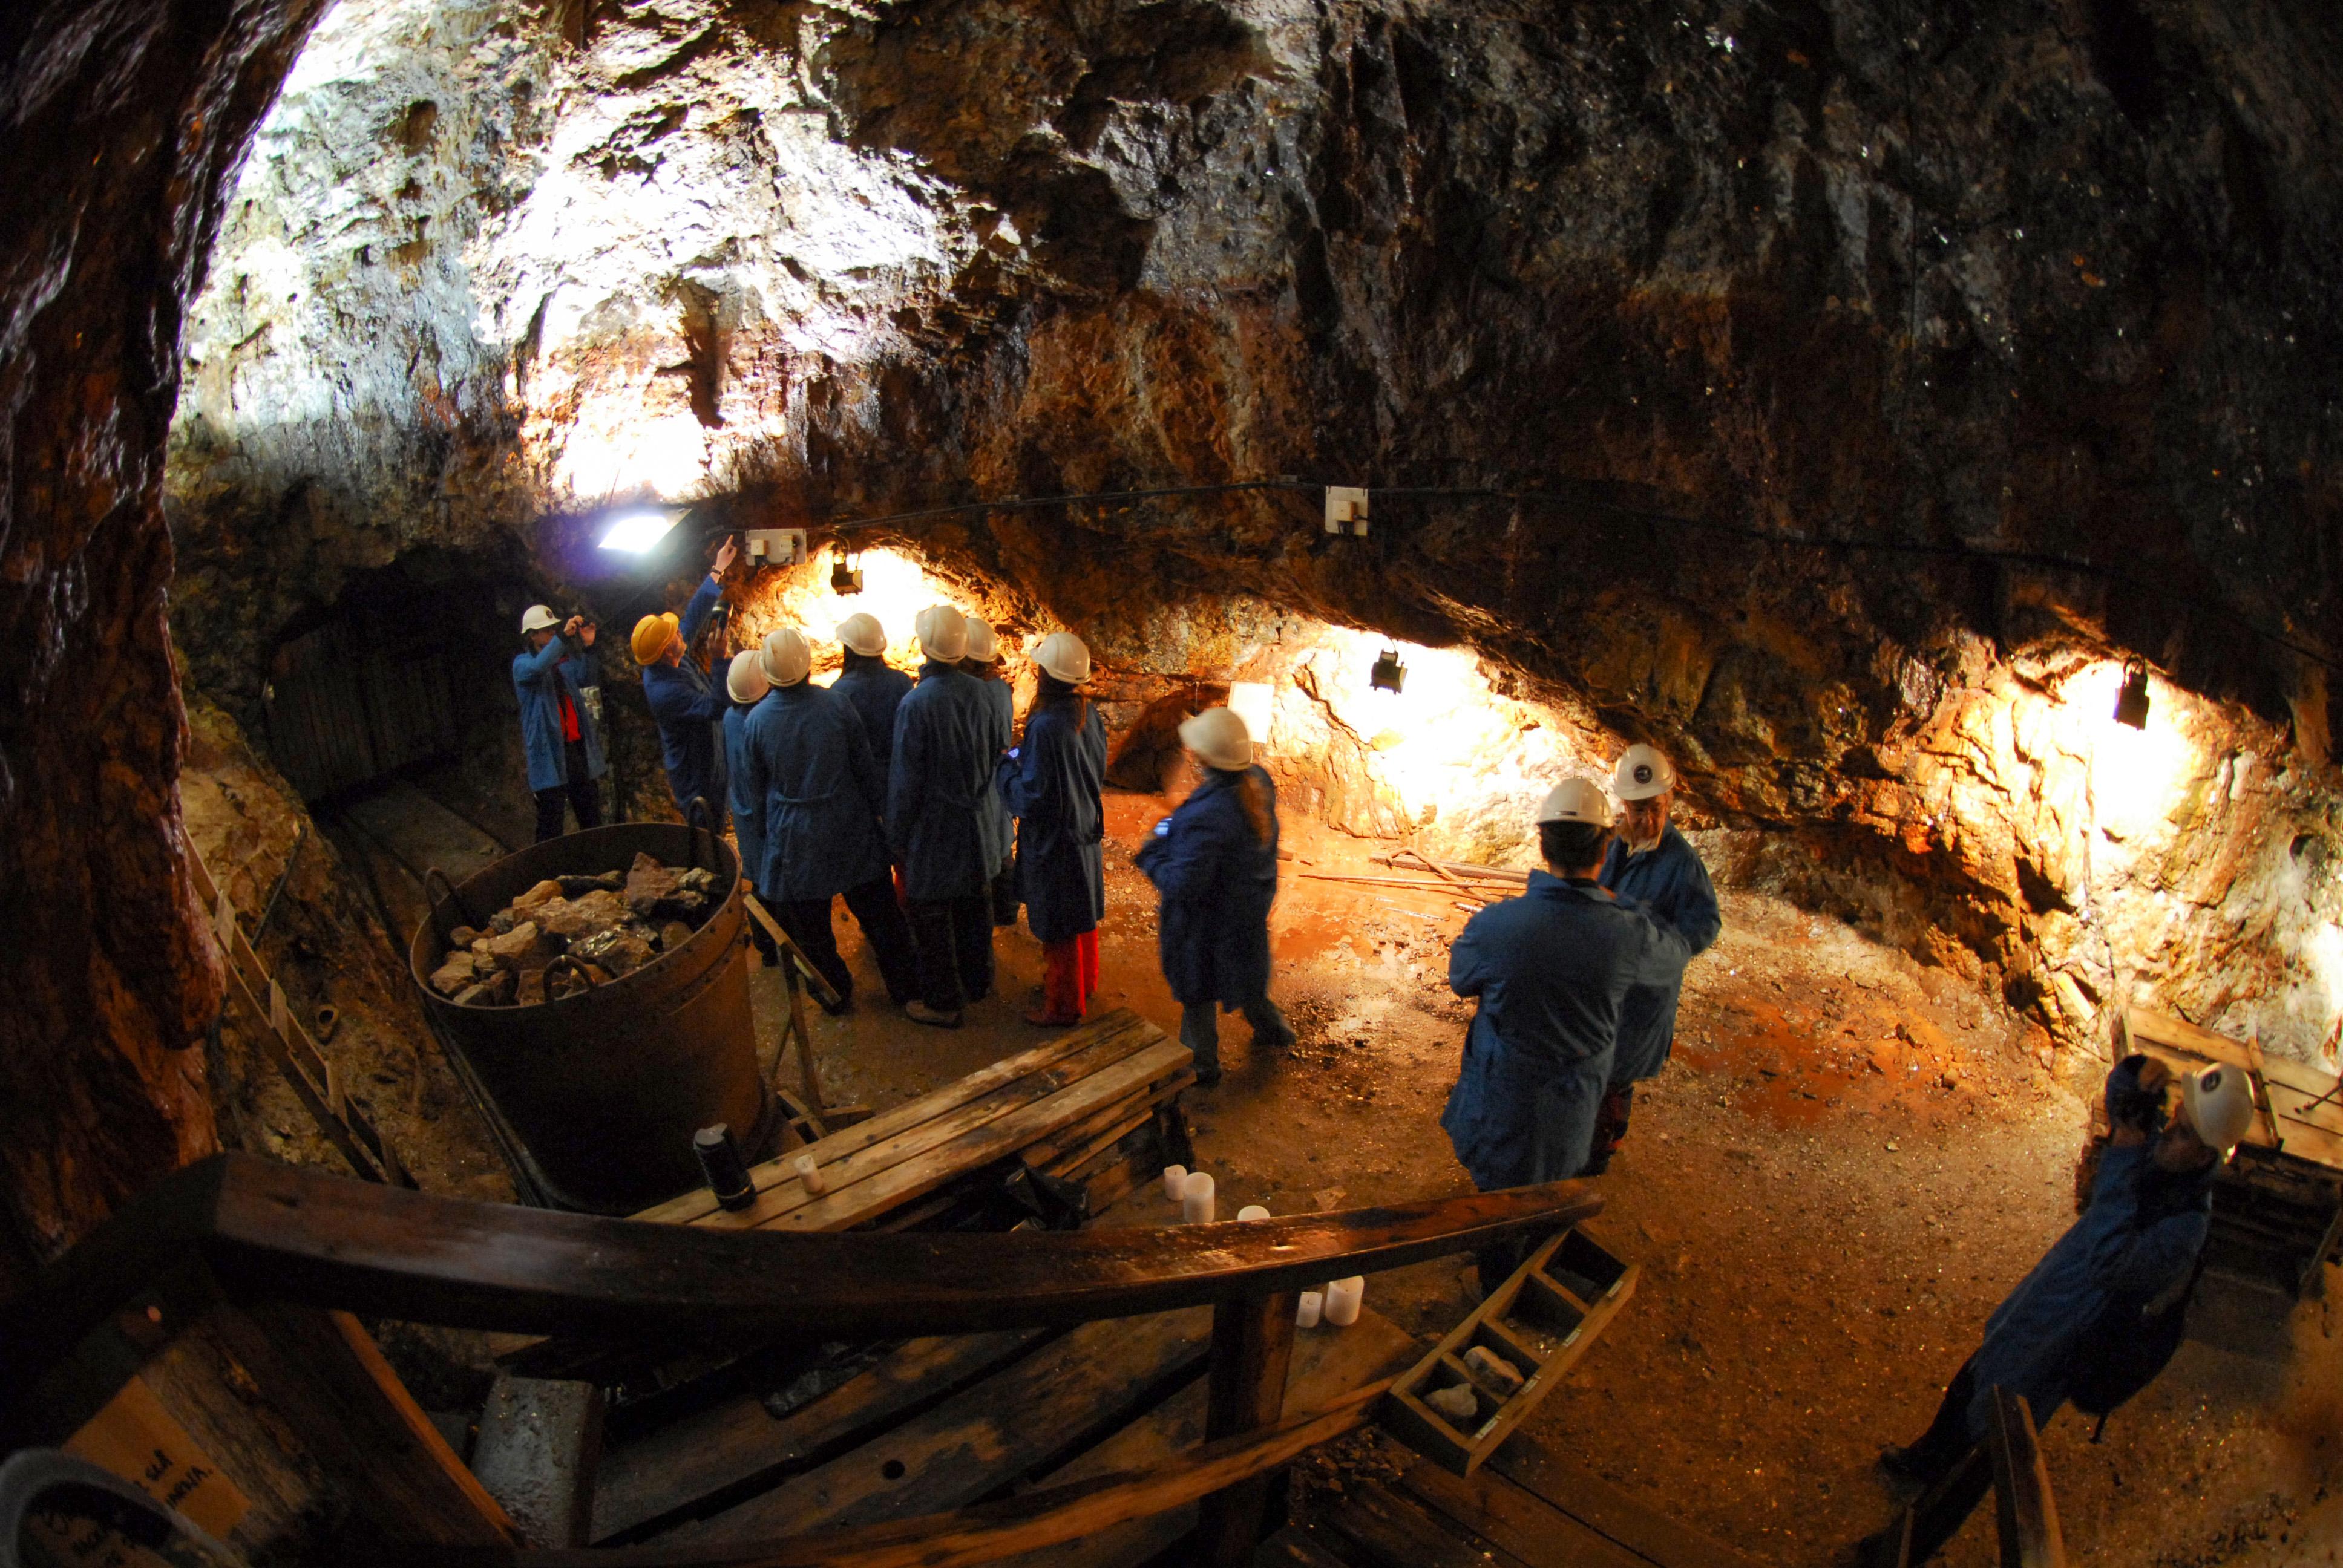 varuträsk gruva adventurepark